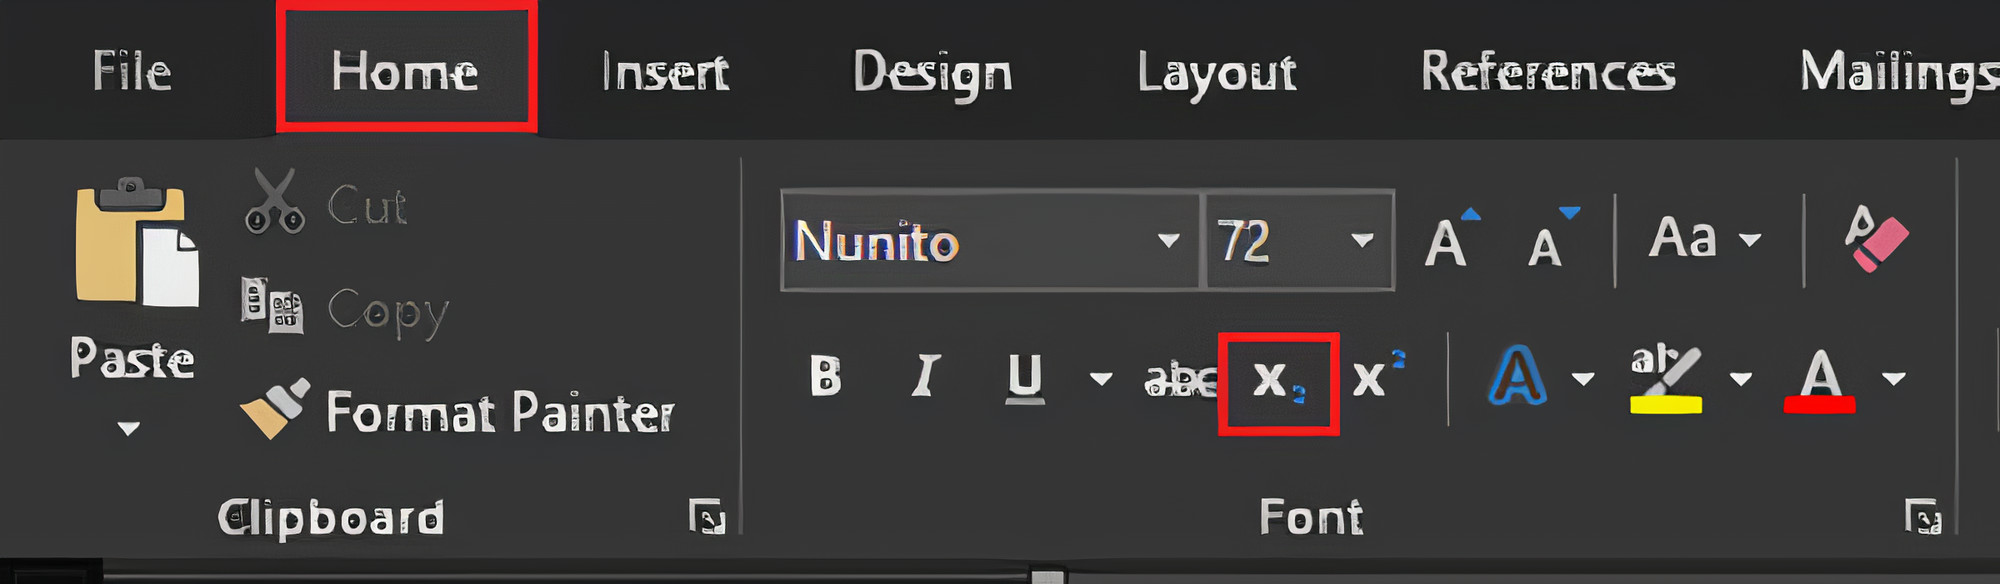 Cara membuat pangkat atas (supescript) dan pangkat bawah (subscript) di Microsoft Word dengan mudah.